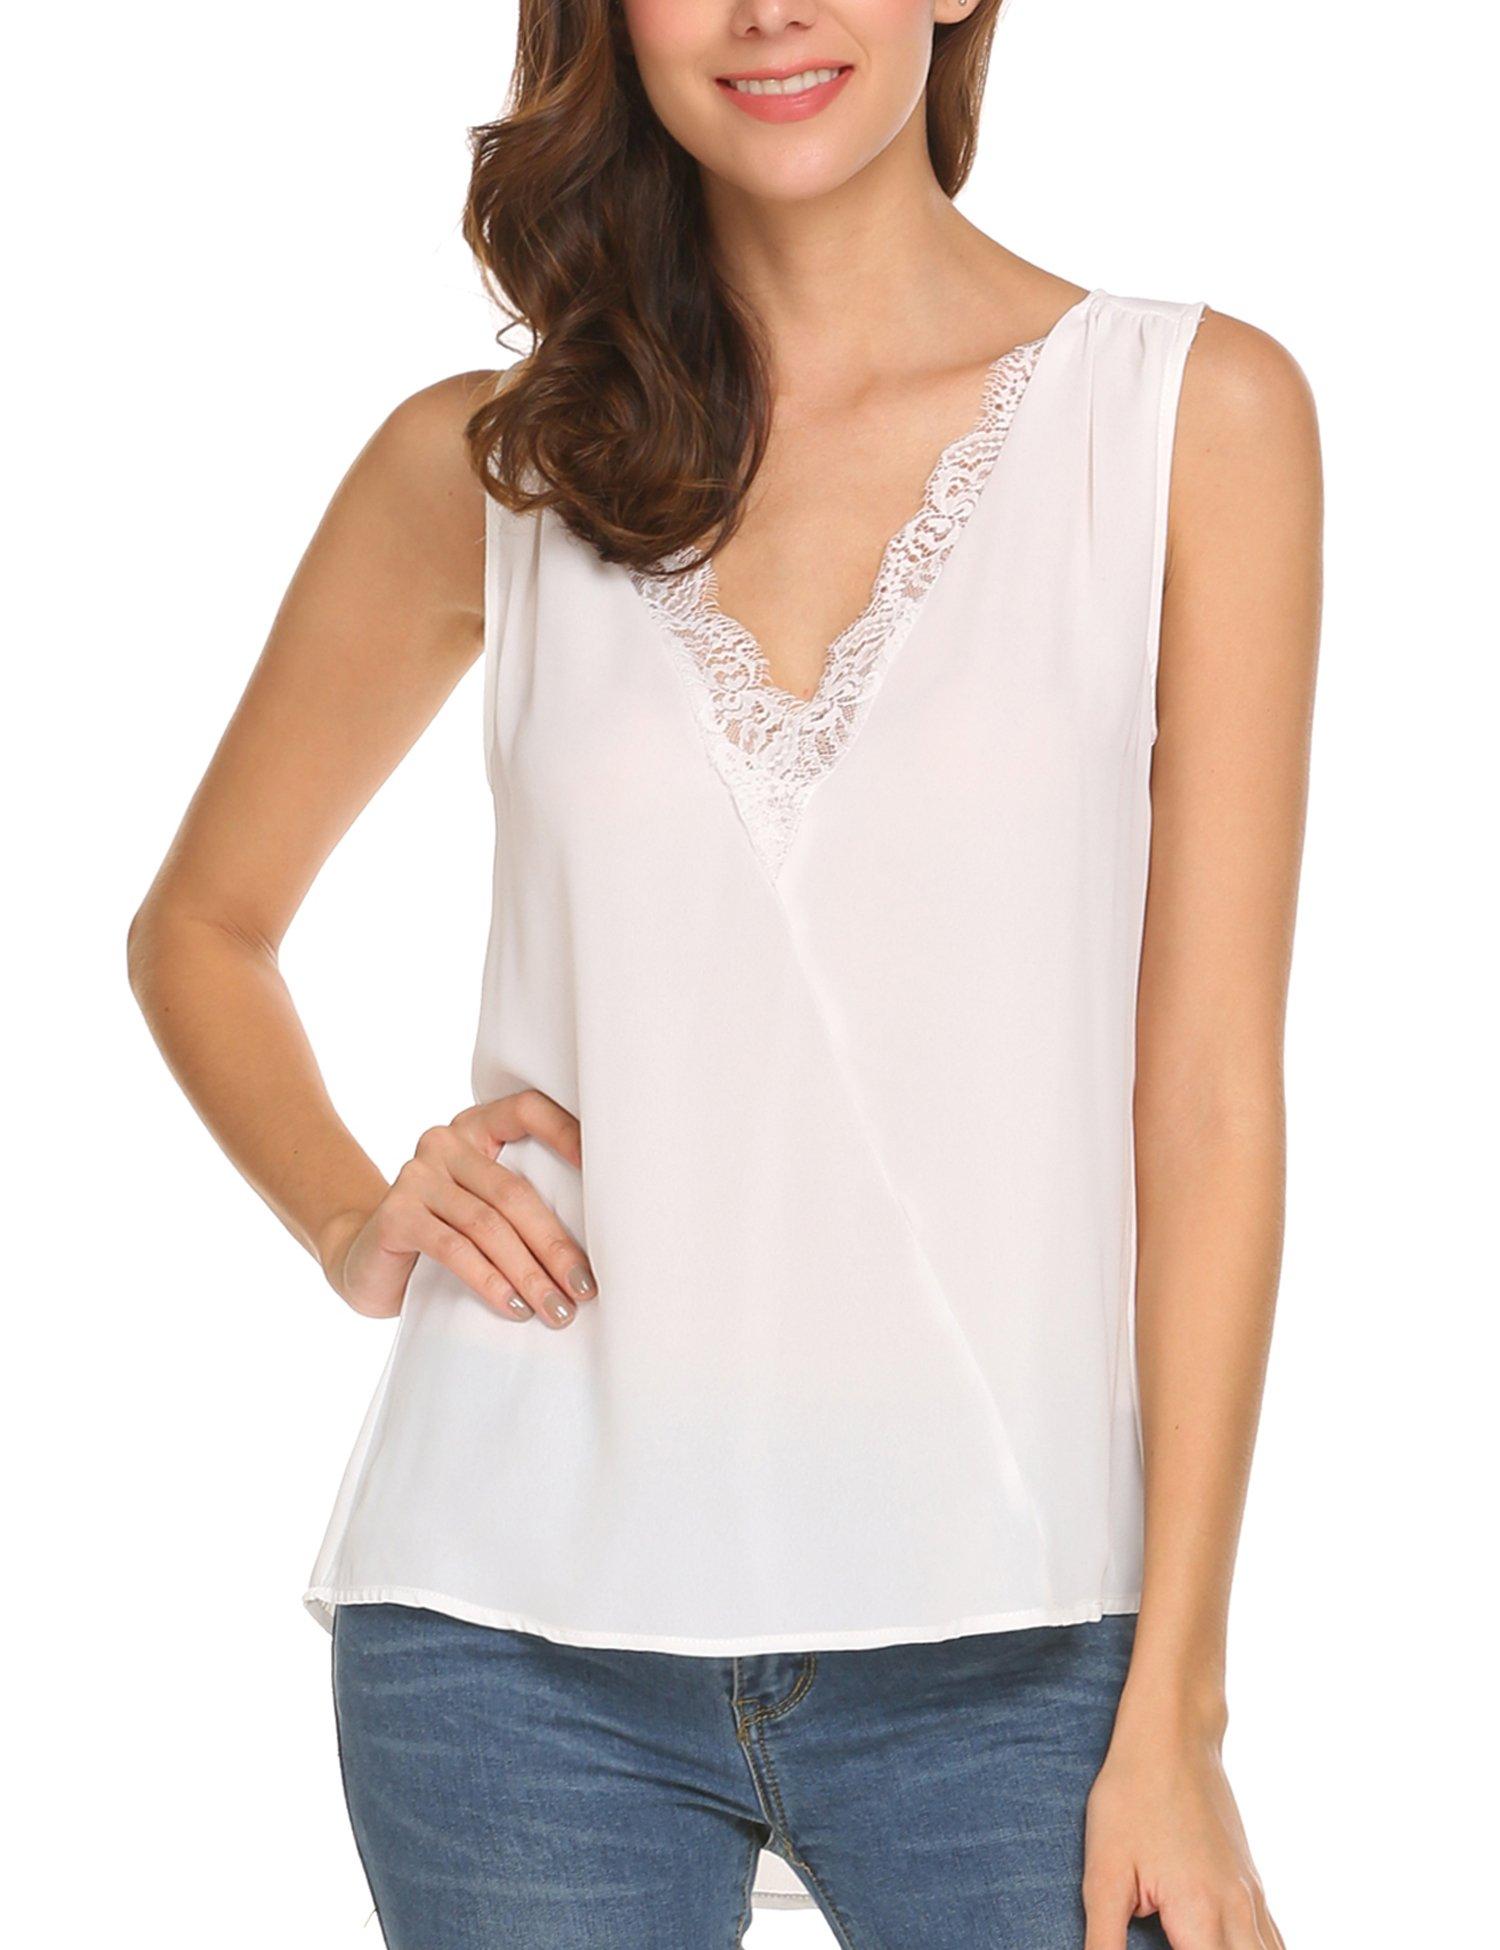 ThinIce Women's Casual Summer Chiffon Lace Slice Tank Top Sleeveless Blouse Shirt (White, X-Large)